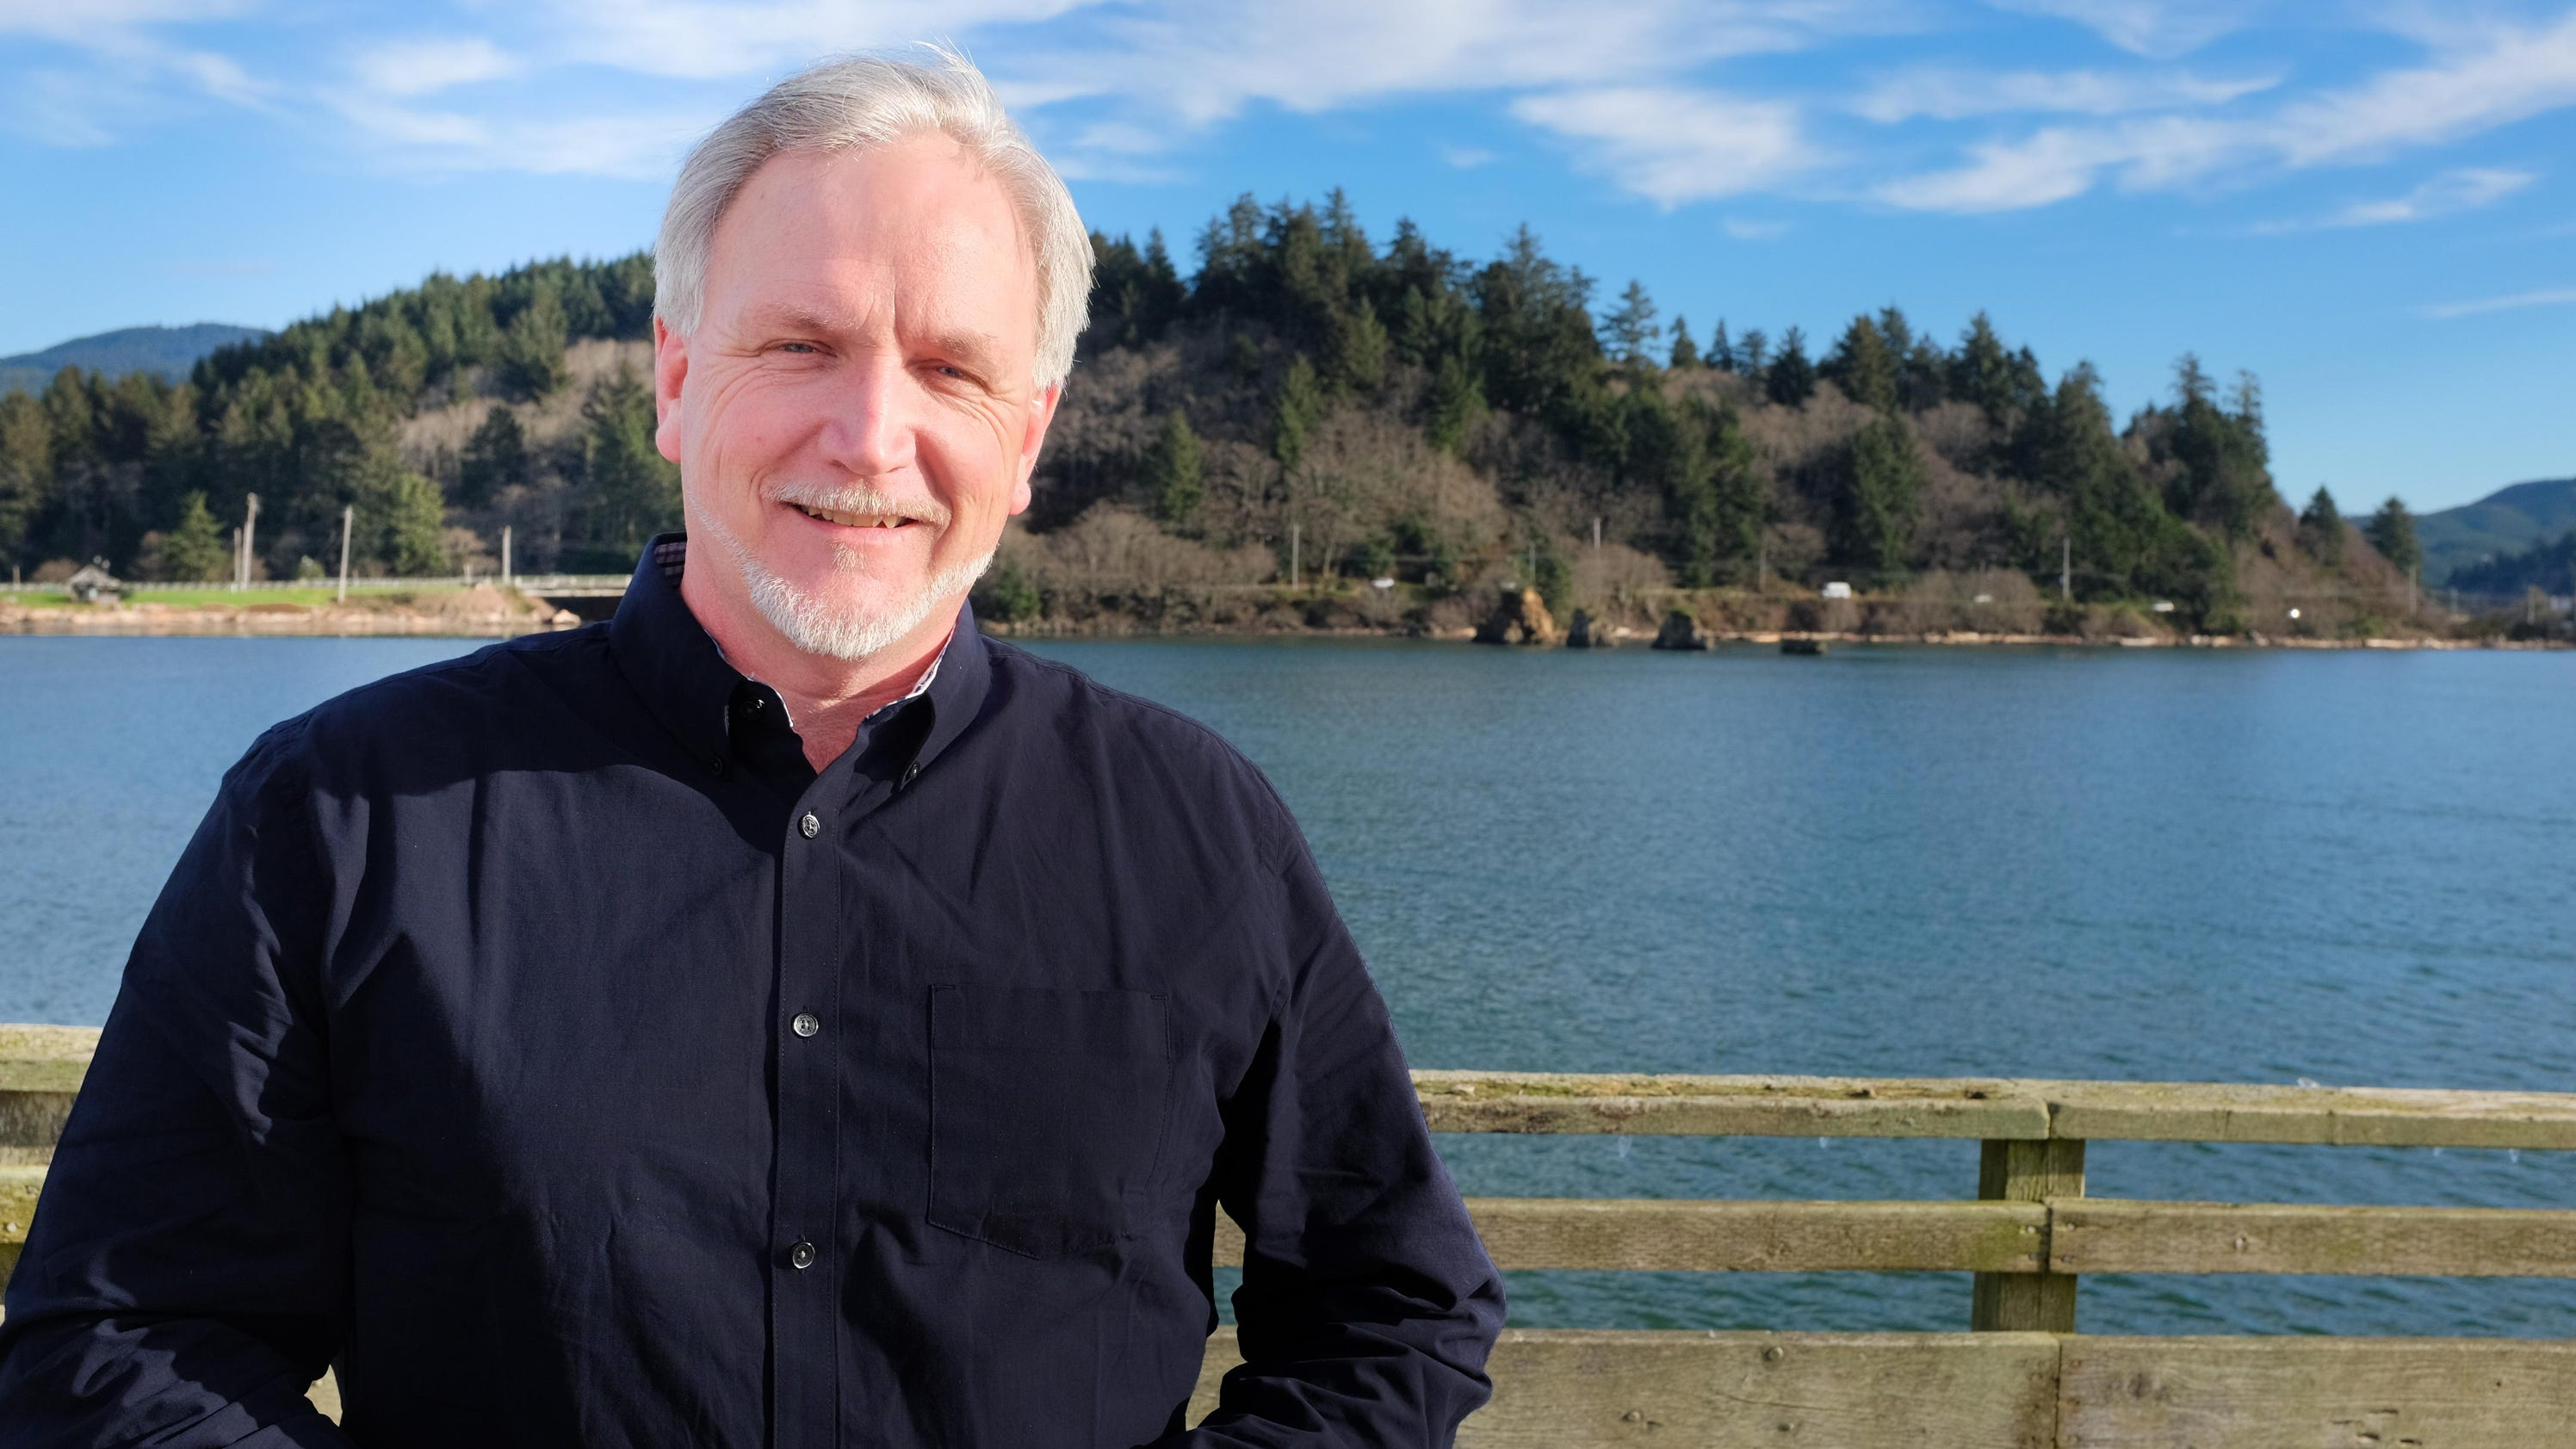 Car Dealerships In Salem Oregon >> Lincoln City Oregon Newspaper Obituaries. Drift Creek Trail Is A Great Little Hike At The Coast ...